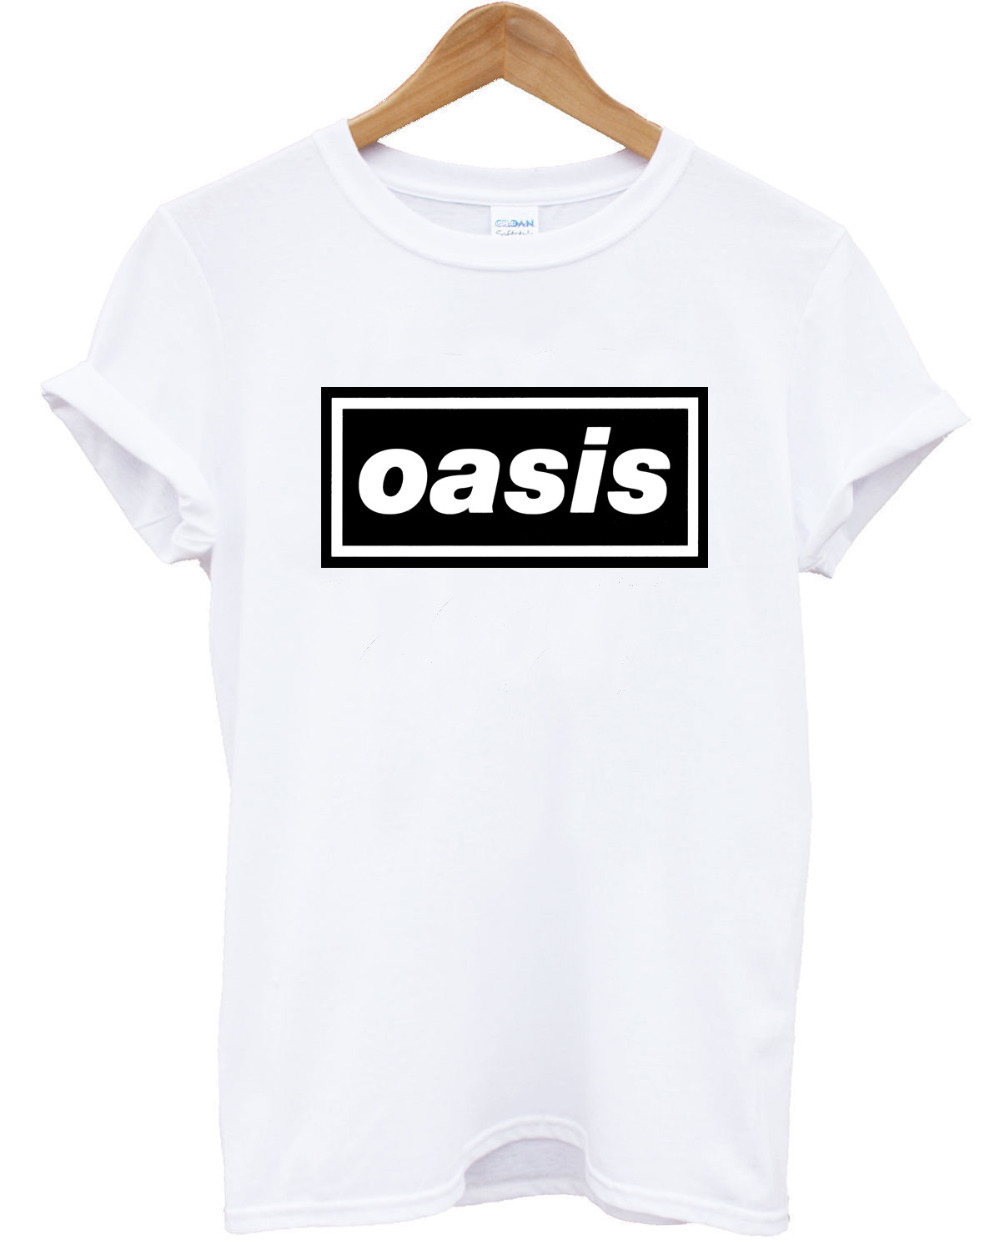 Fashion oasis print short sleeve t shirt unisex cotton for T shirt drop shipping companies